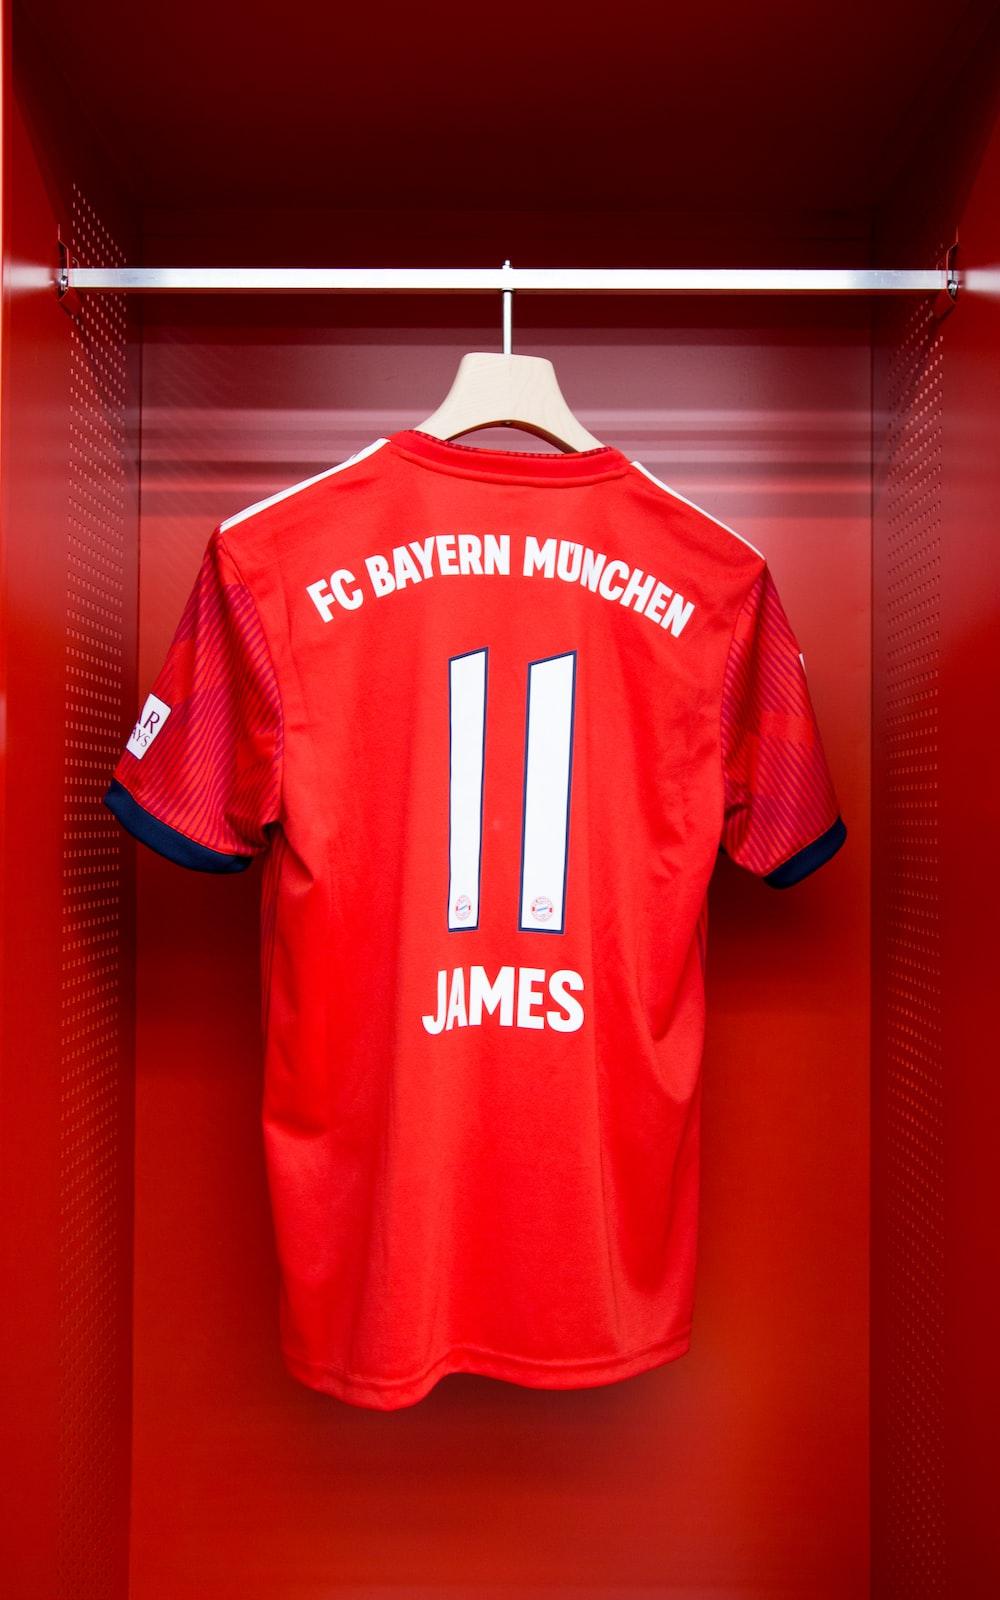 red FC Bayern Munchen James 11 jersey